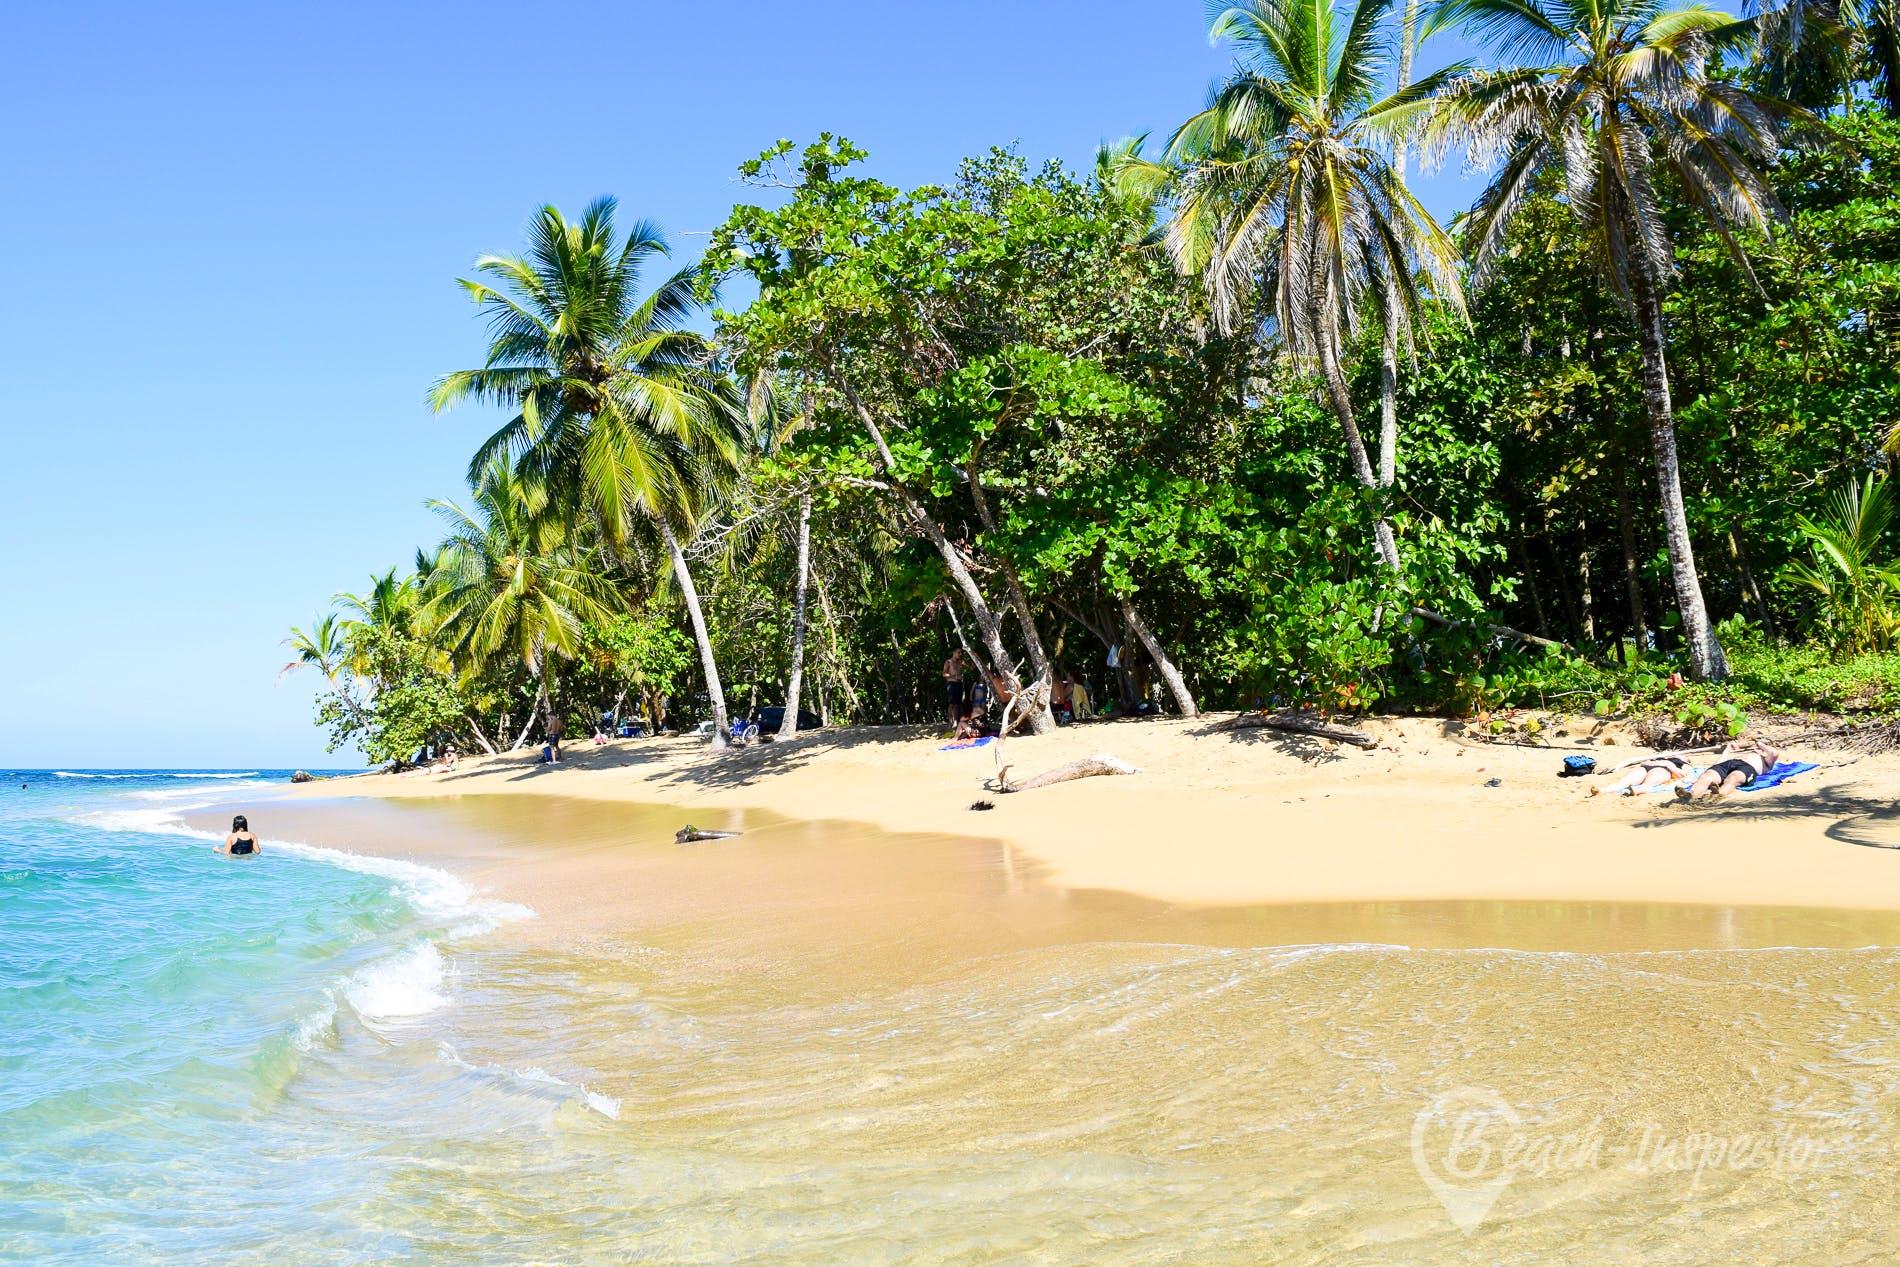 Playa Playa Punta Uva, Costa Rica, Costa Rica